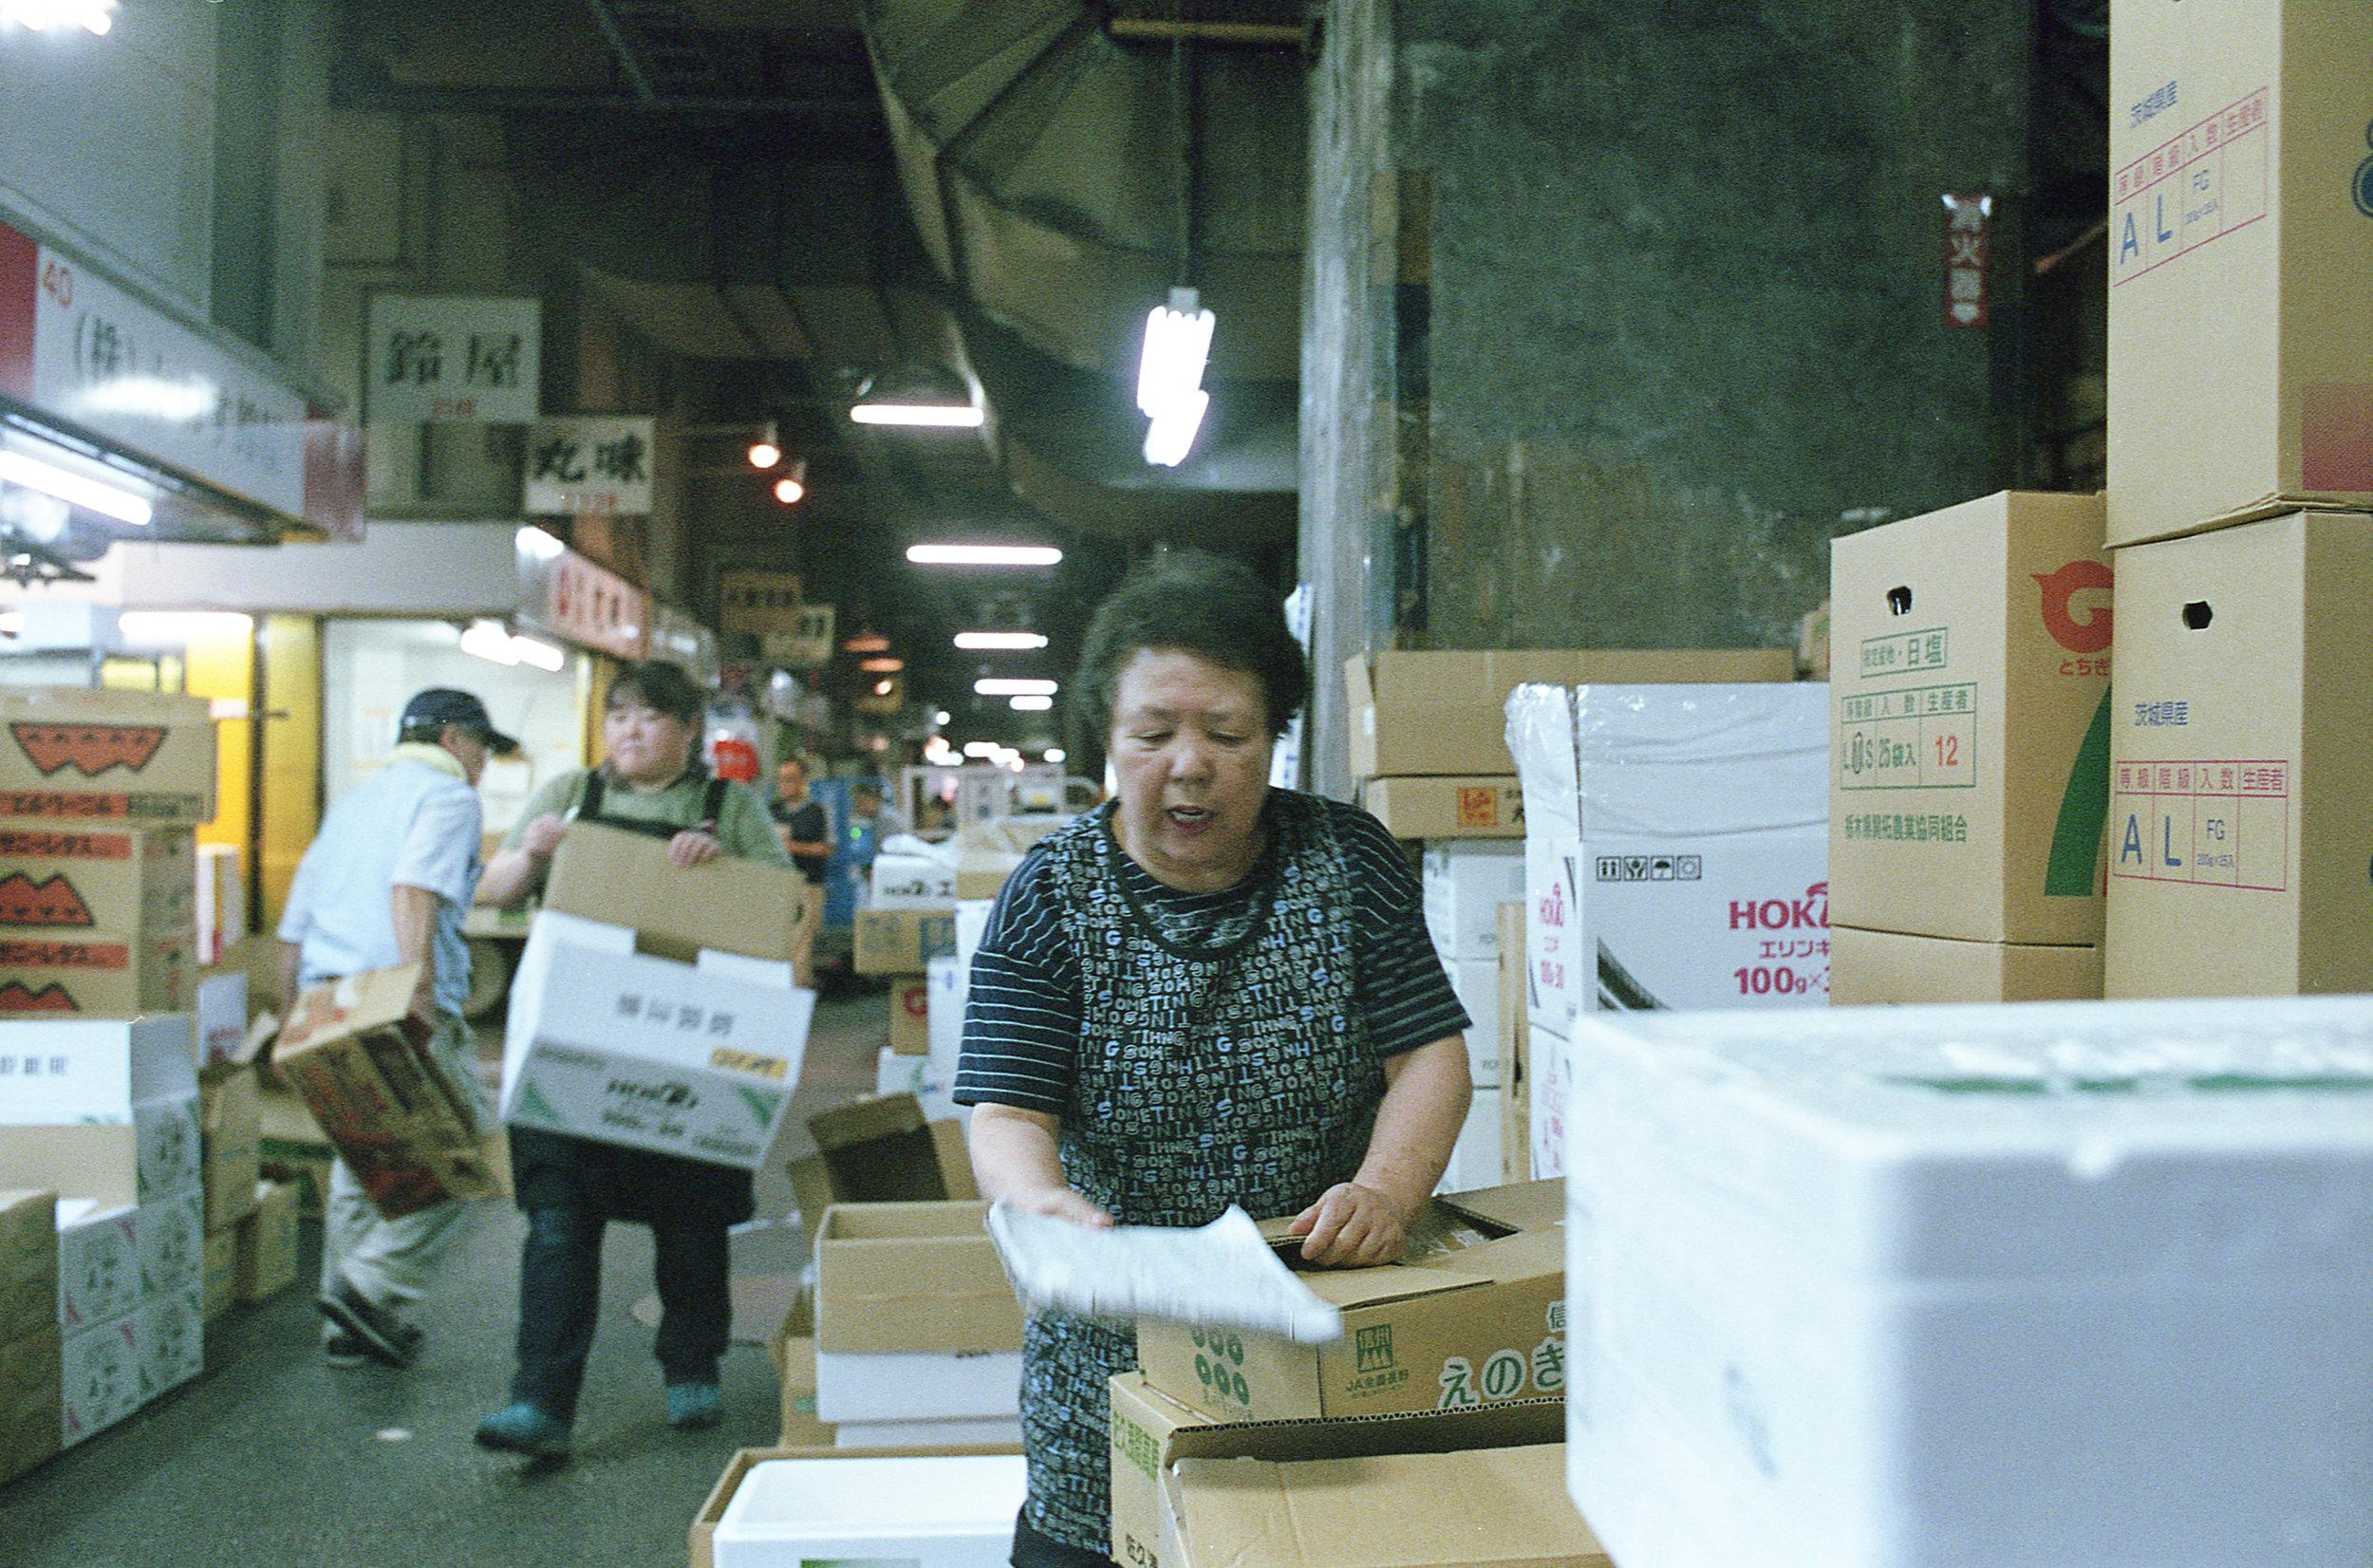 20180830_TsukijiMarket_026s.jpg